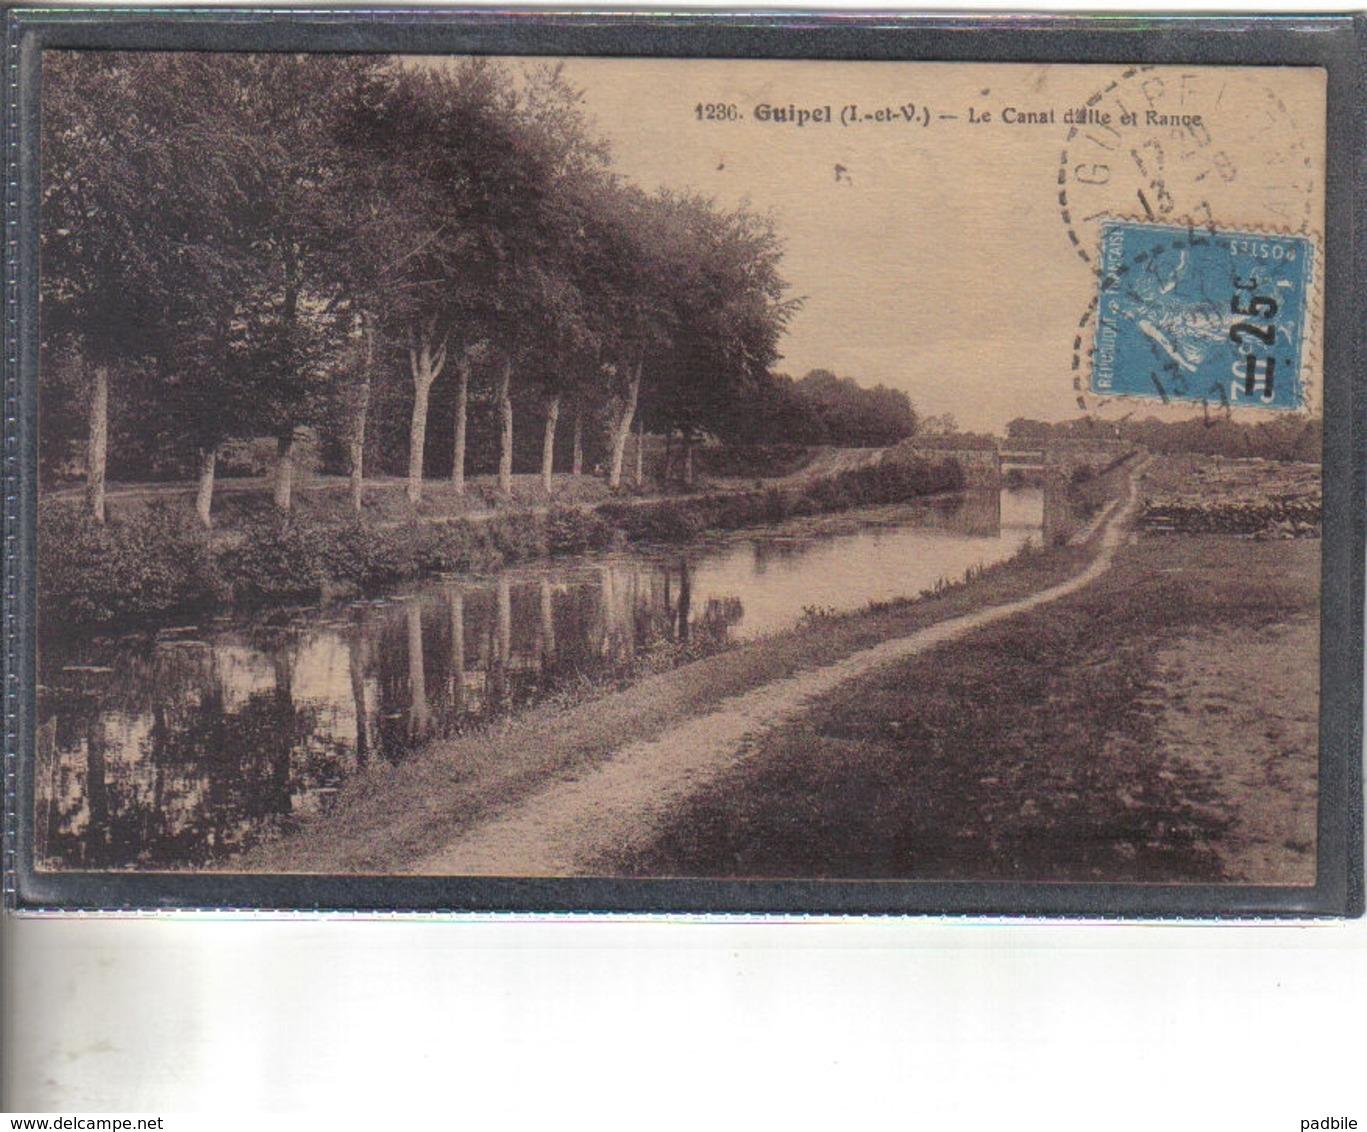 Carte Postale 35. Guipel  Très Beau Plan - France